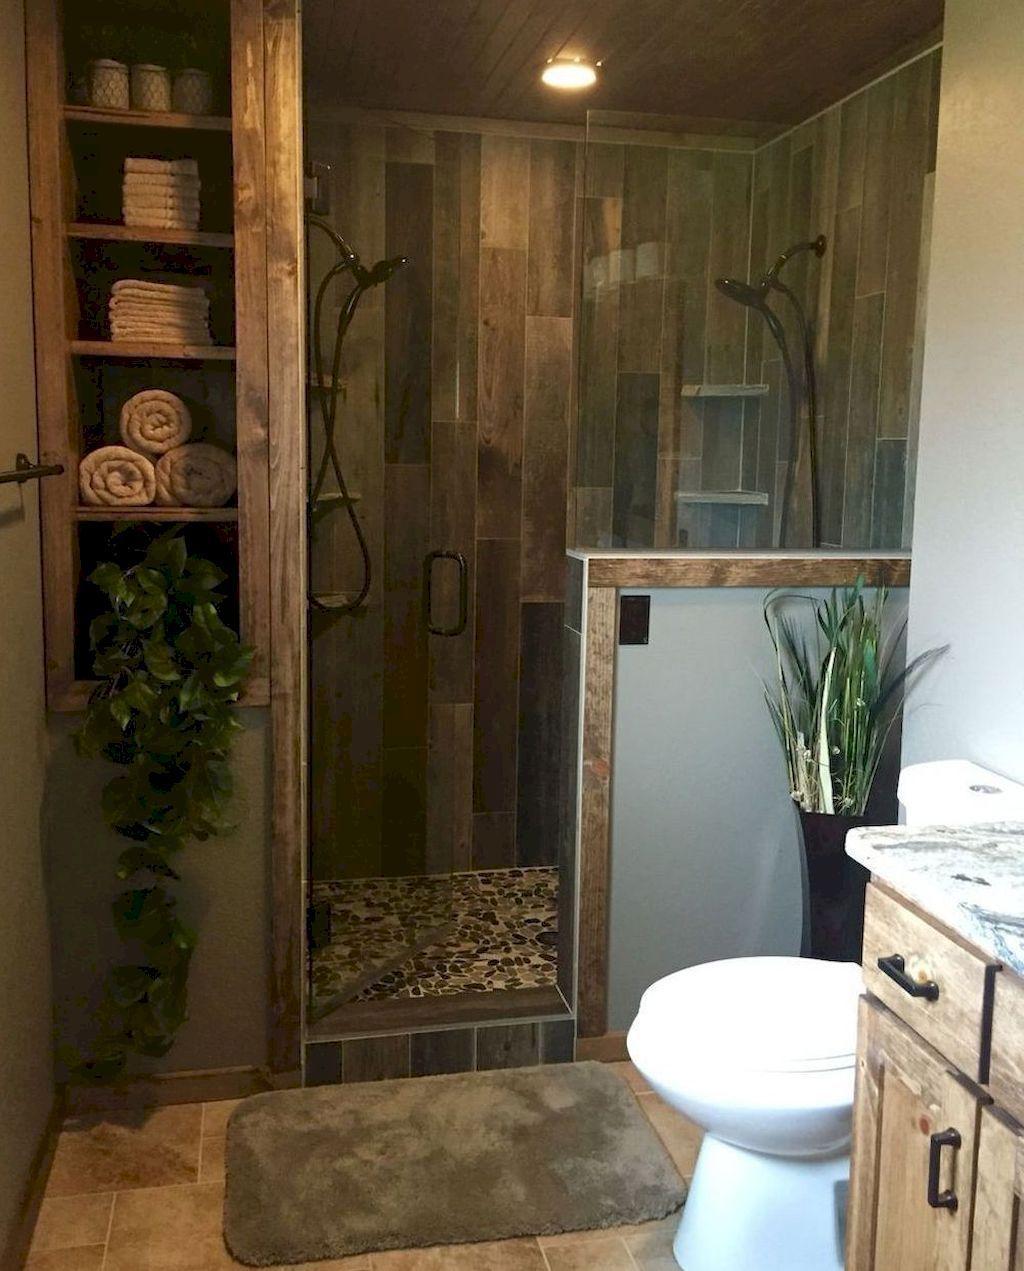 Small Bathroom Remodel Design Ideas On A Budget 13 Home Design Bathroom Remodel Master Modern Farmhouse Bathroom Bathroom Remodel Designs